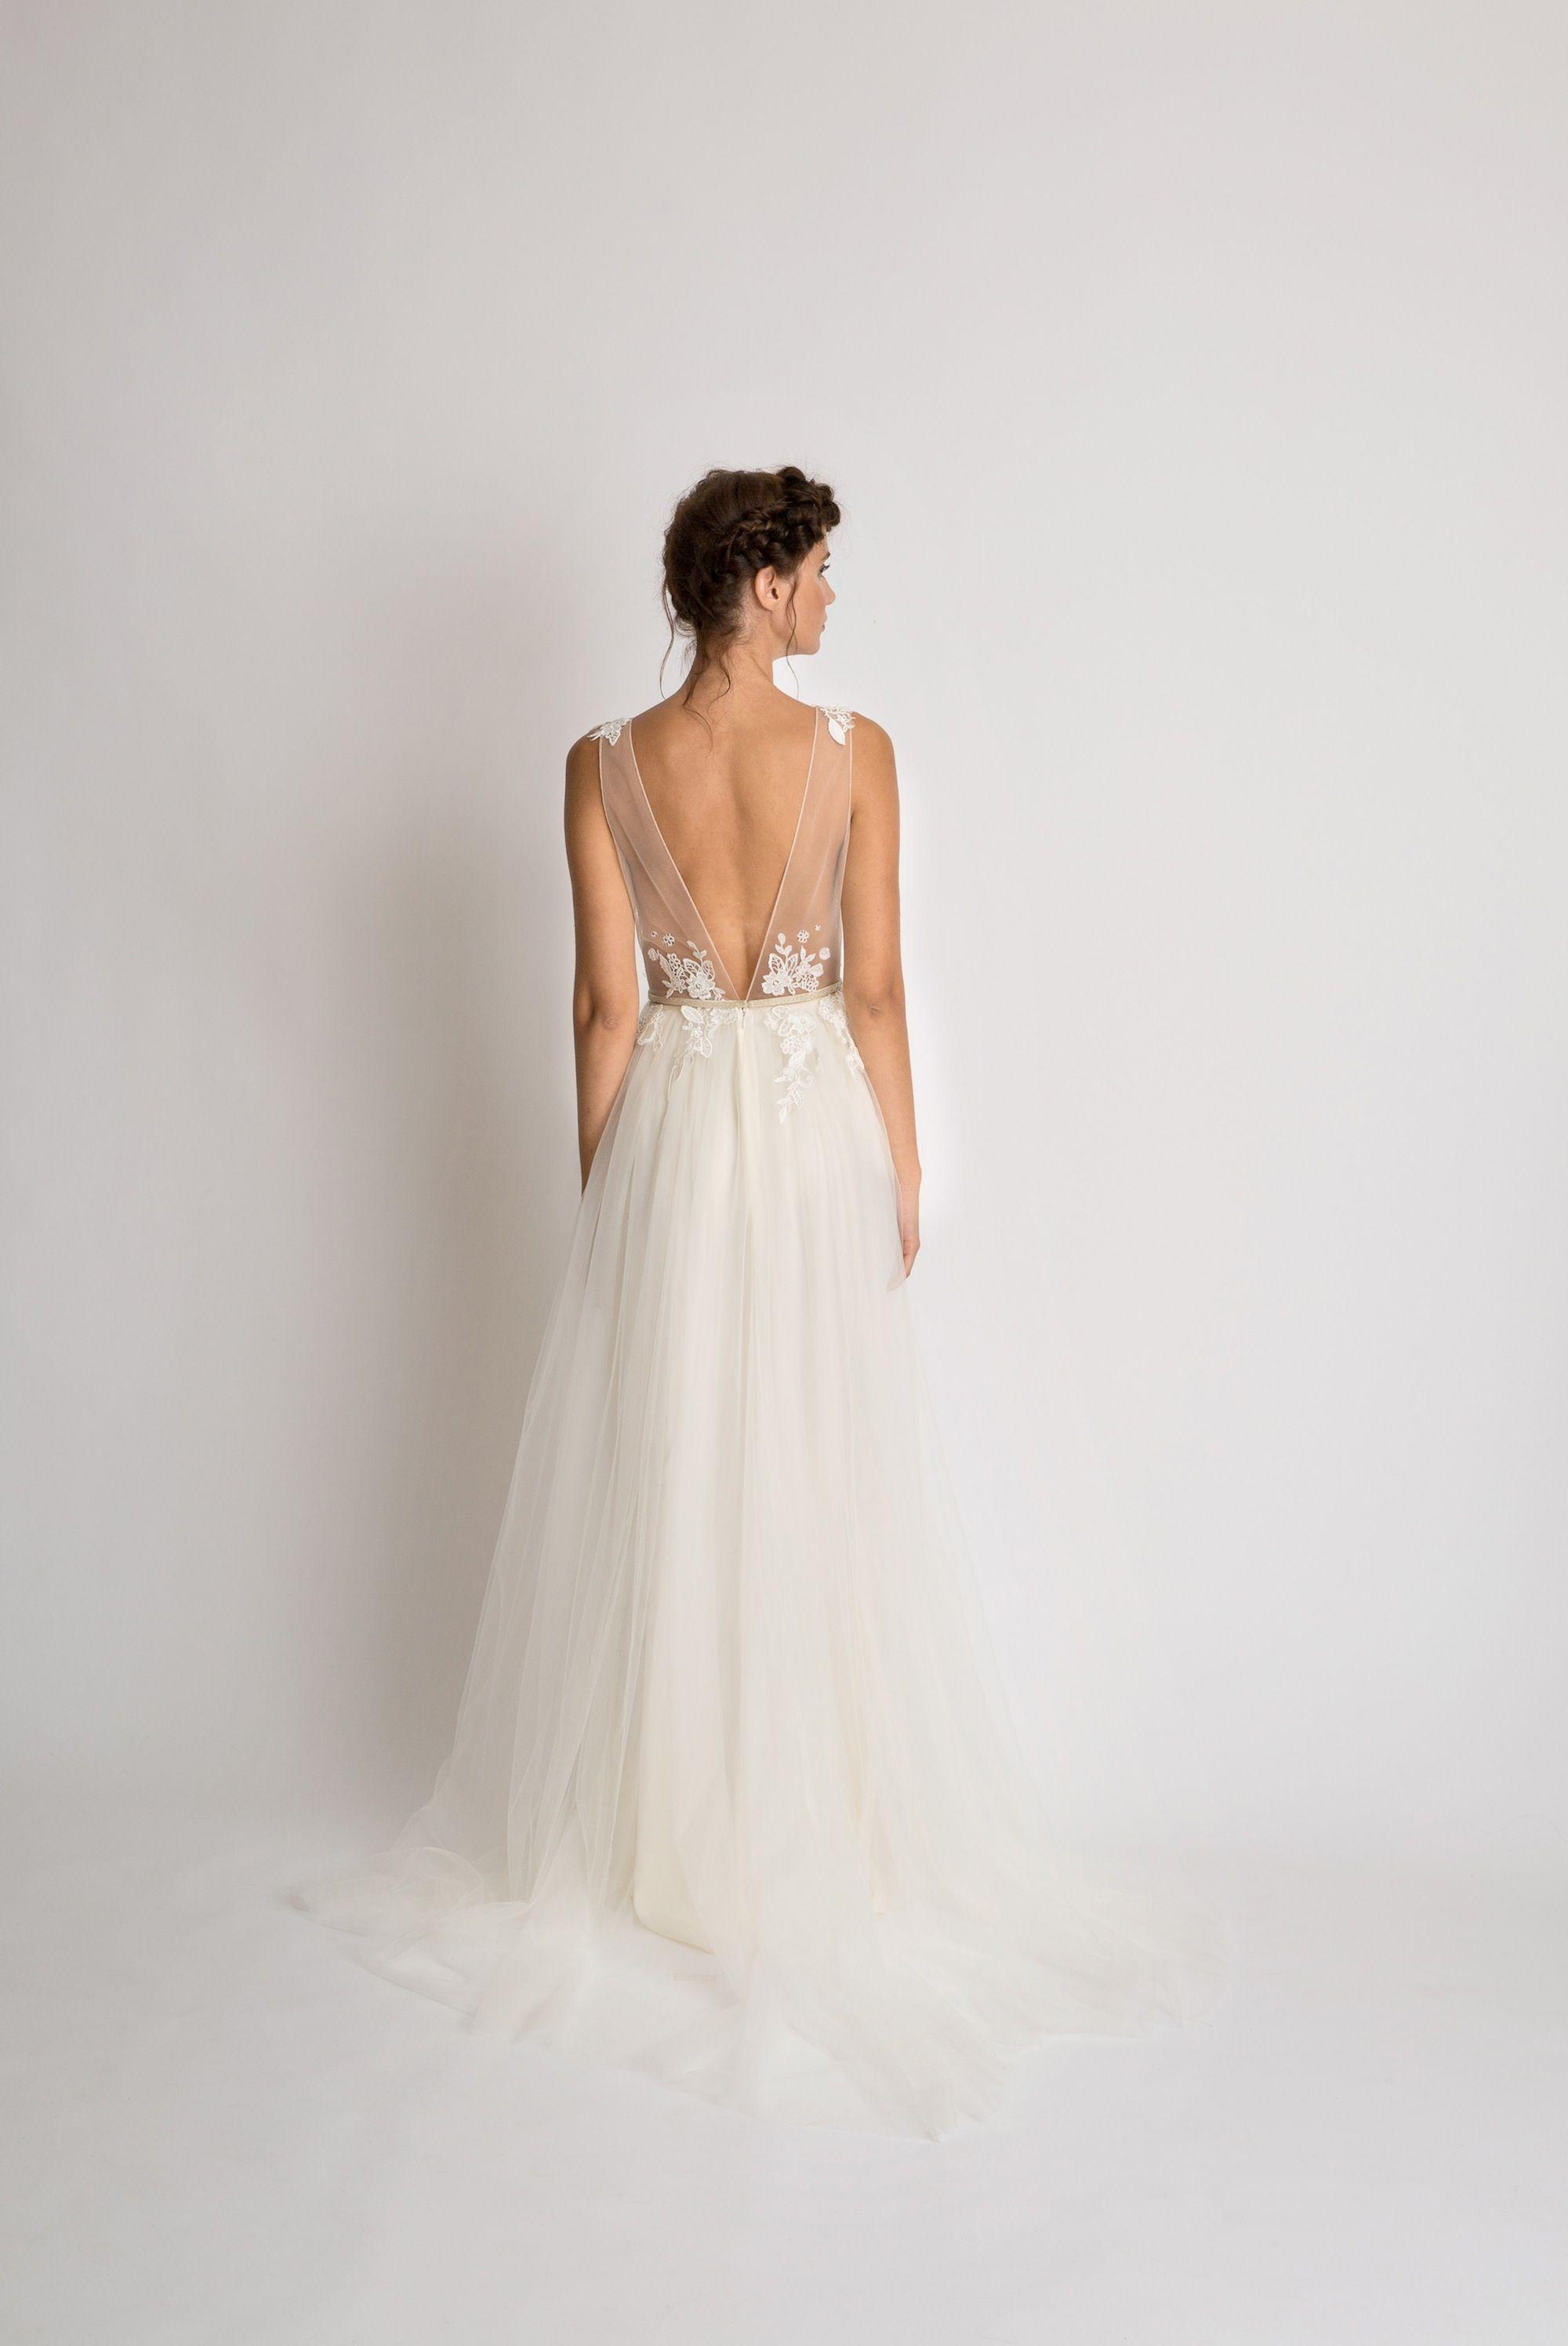 Alexandra Grecco - Isla Gown   dreamWedding   Pinterest   Gowns ...